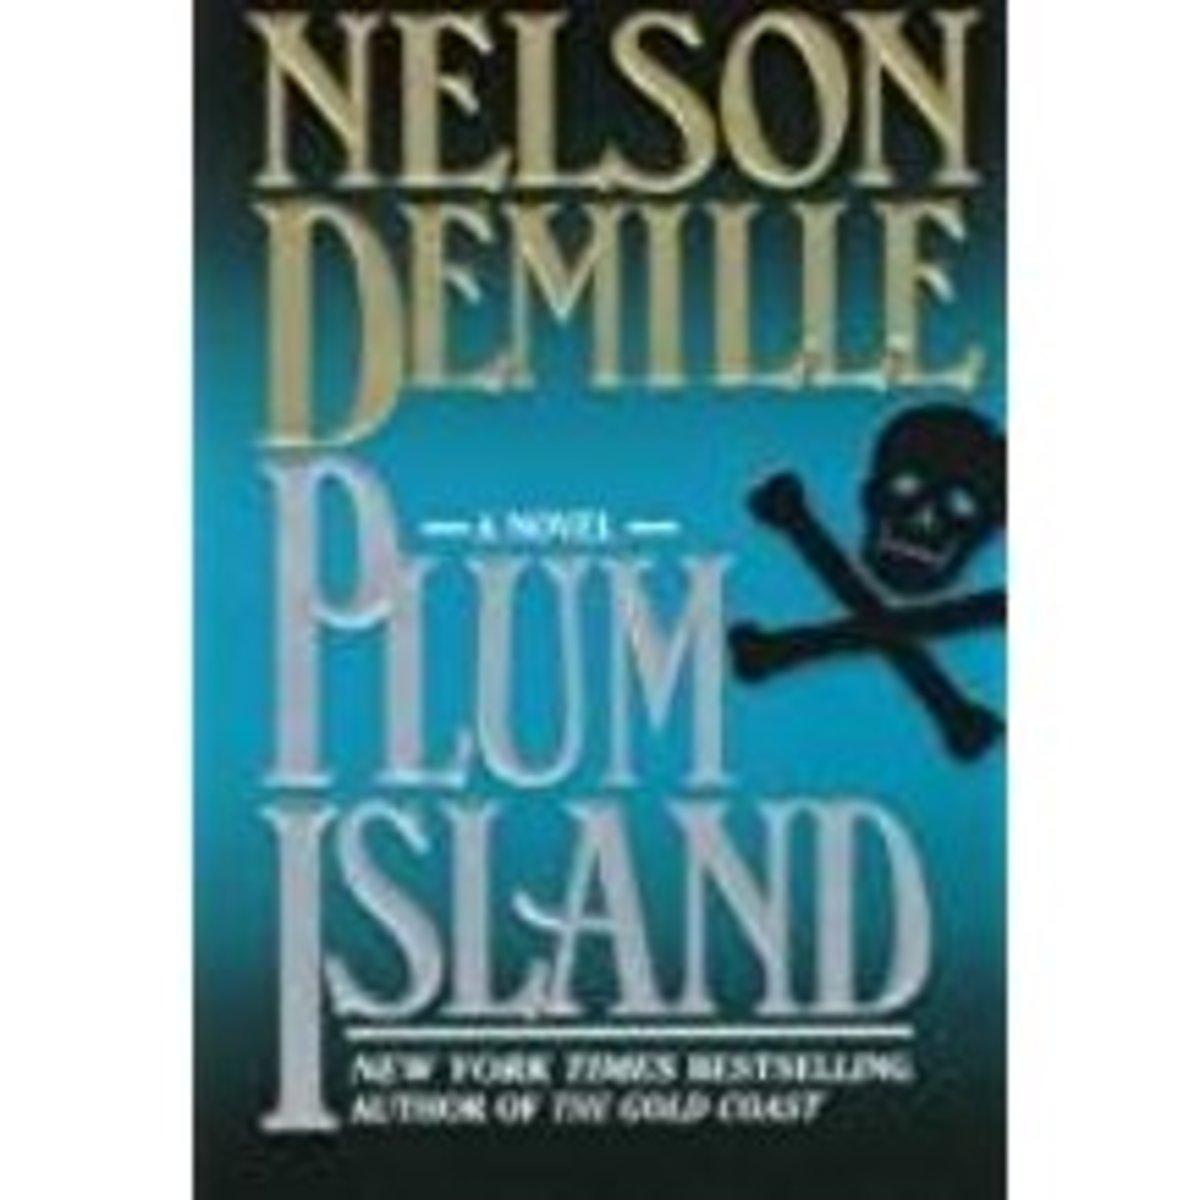 plum island demille